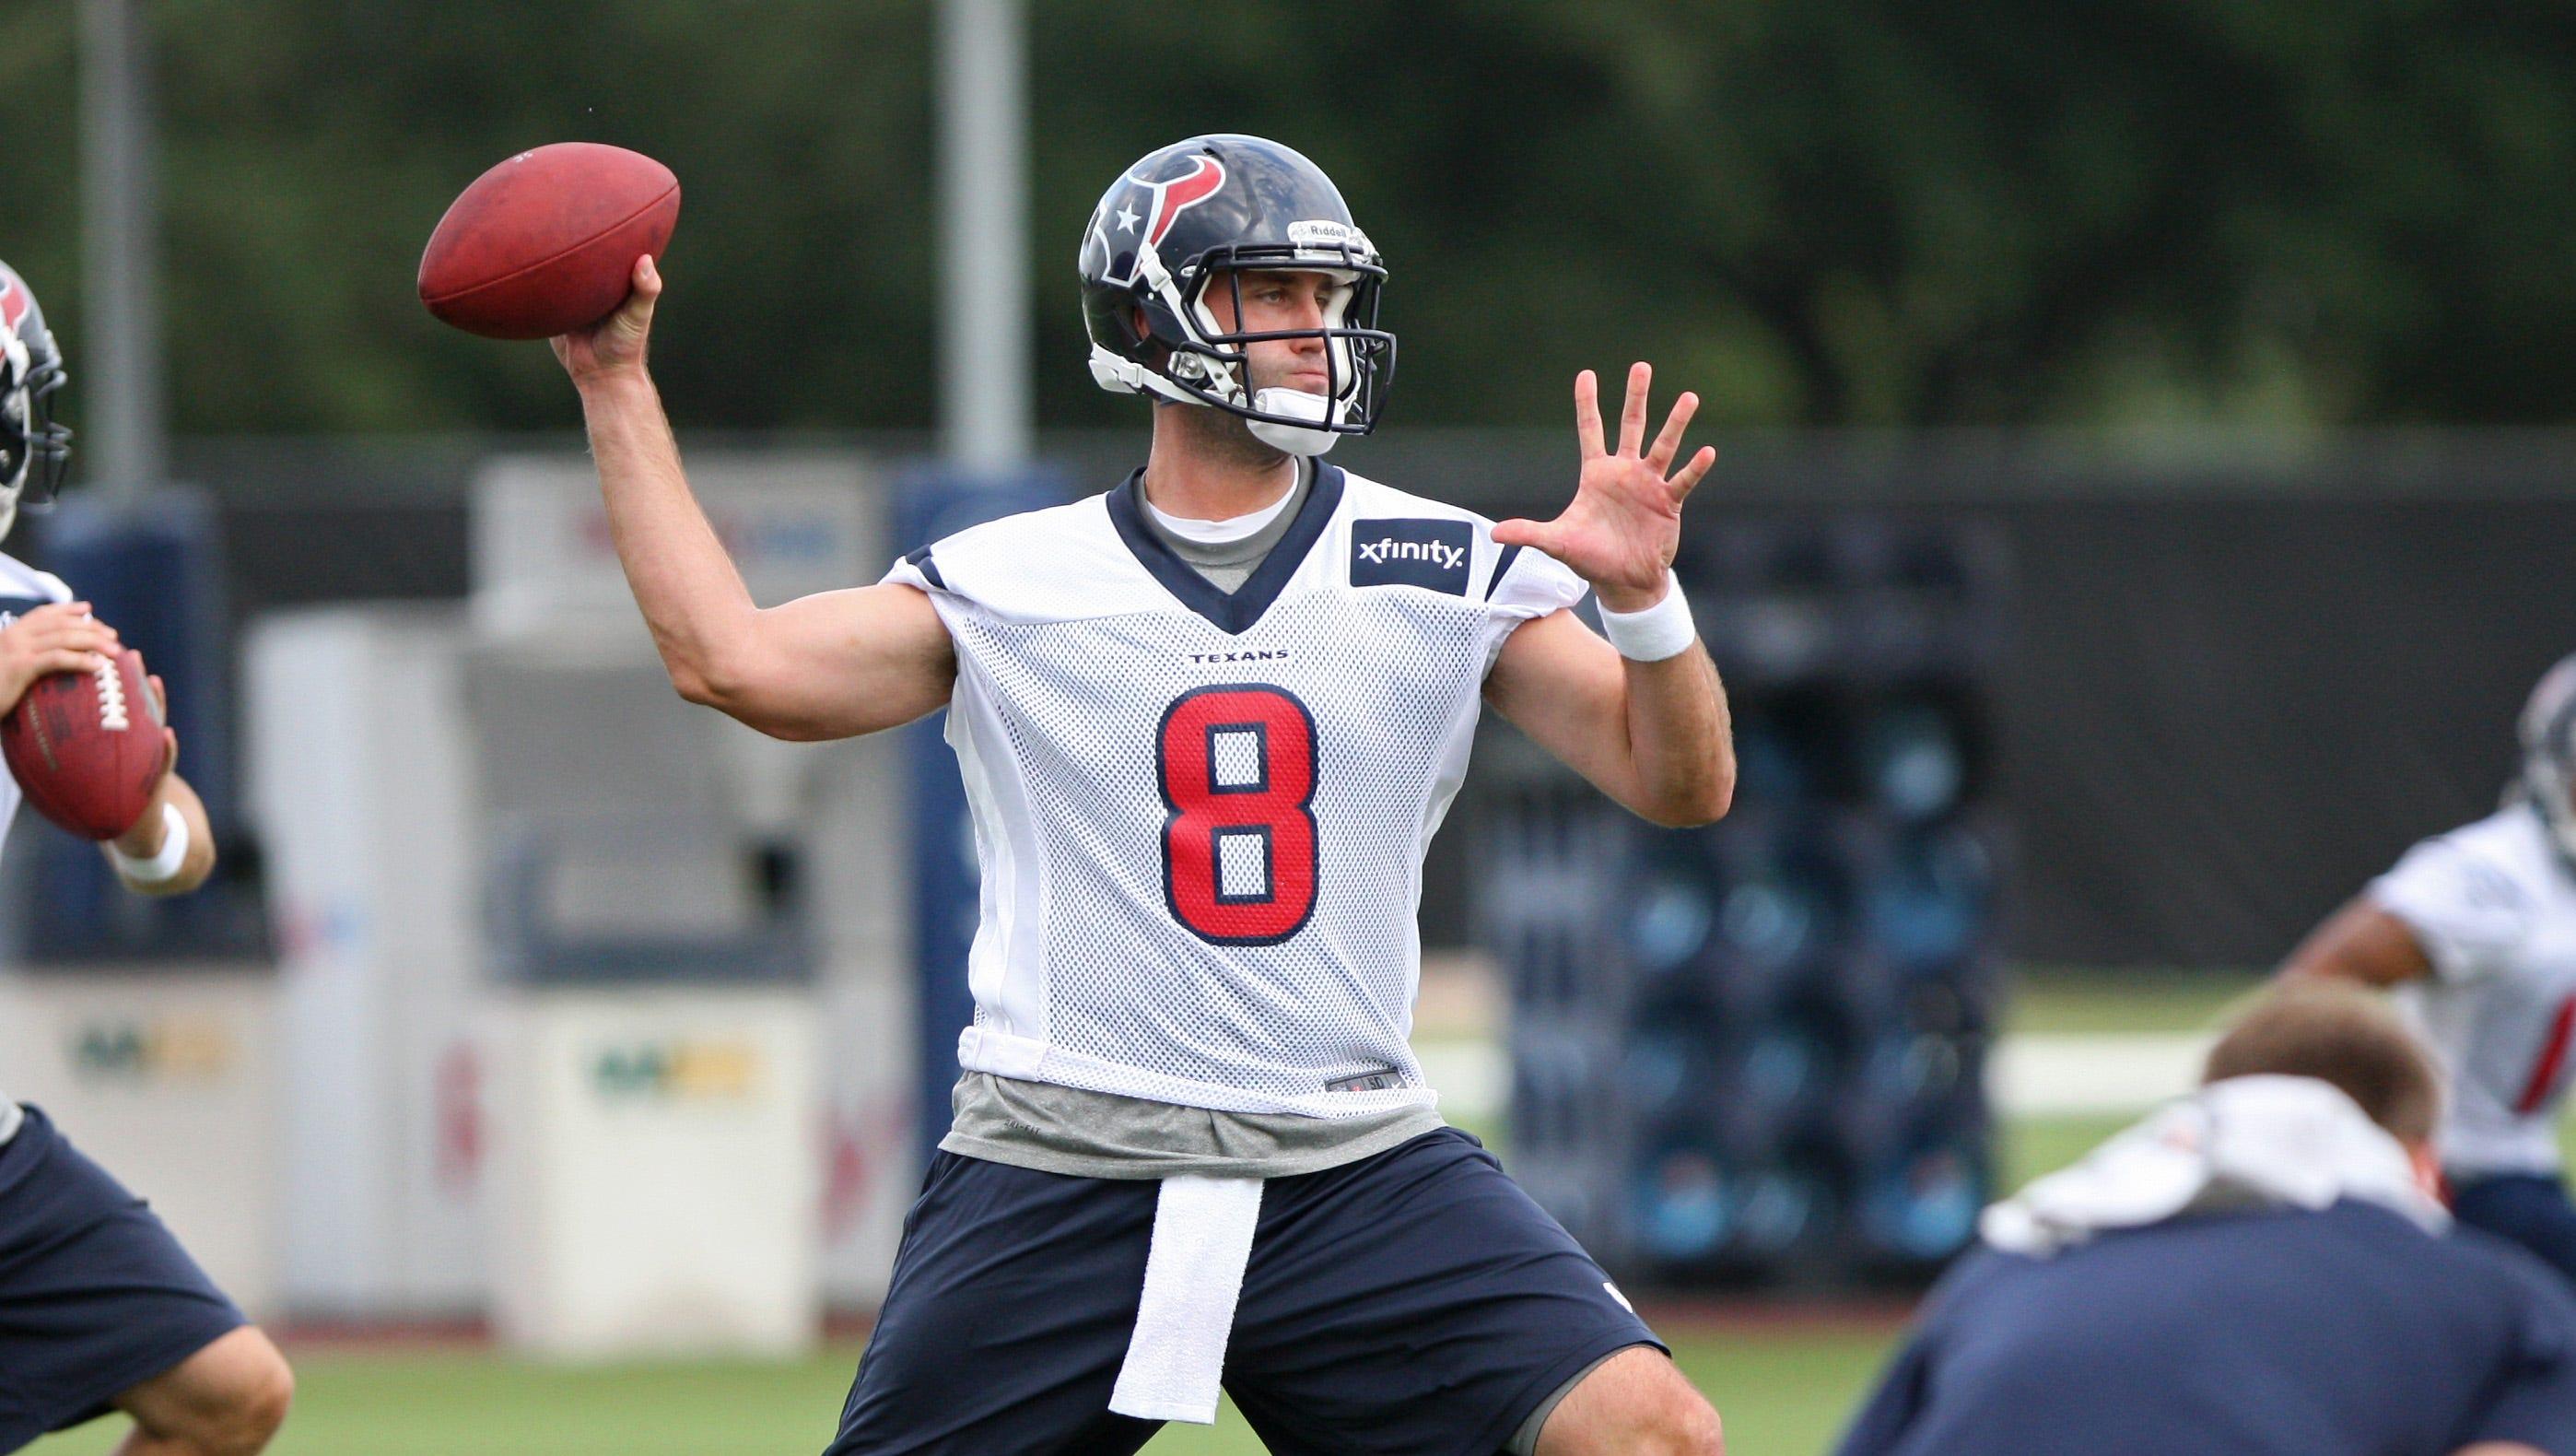 19. Matt Schaub, Houston Texans